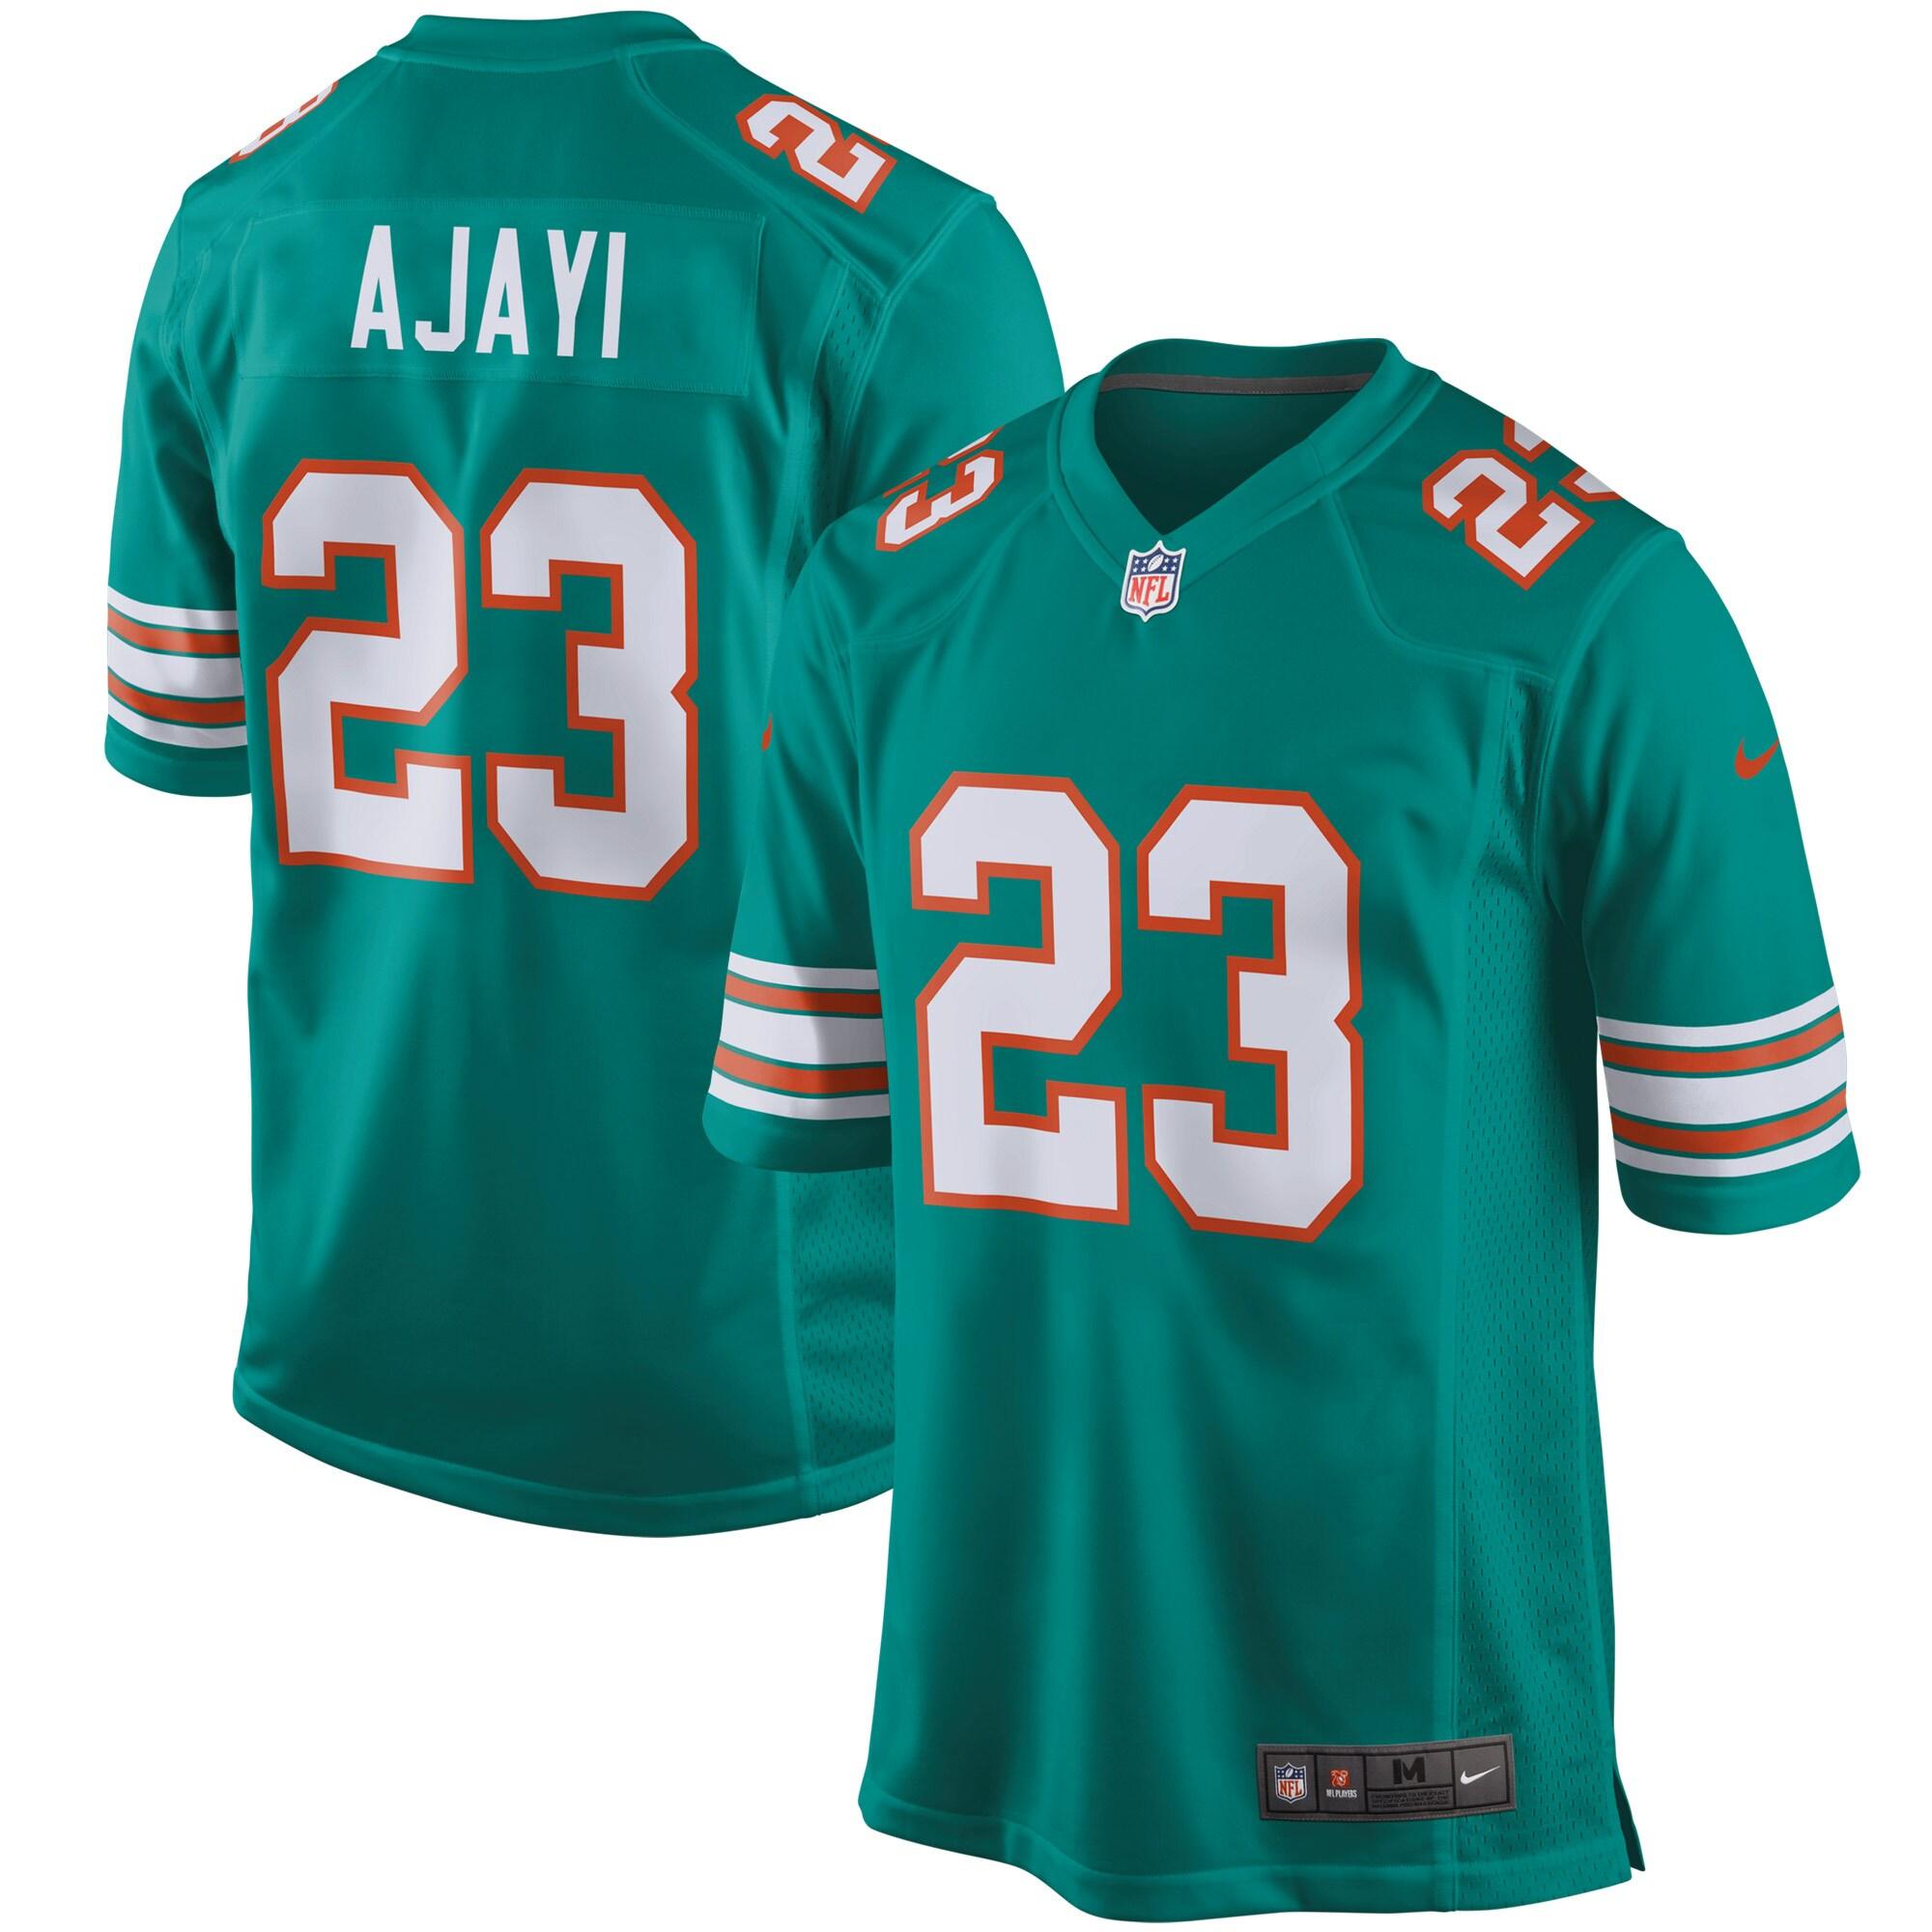 Jay Ajayi Miami Dolphins Nike Youth Alternate Game Jersey - Aqua